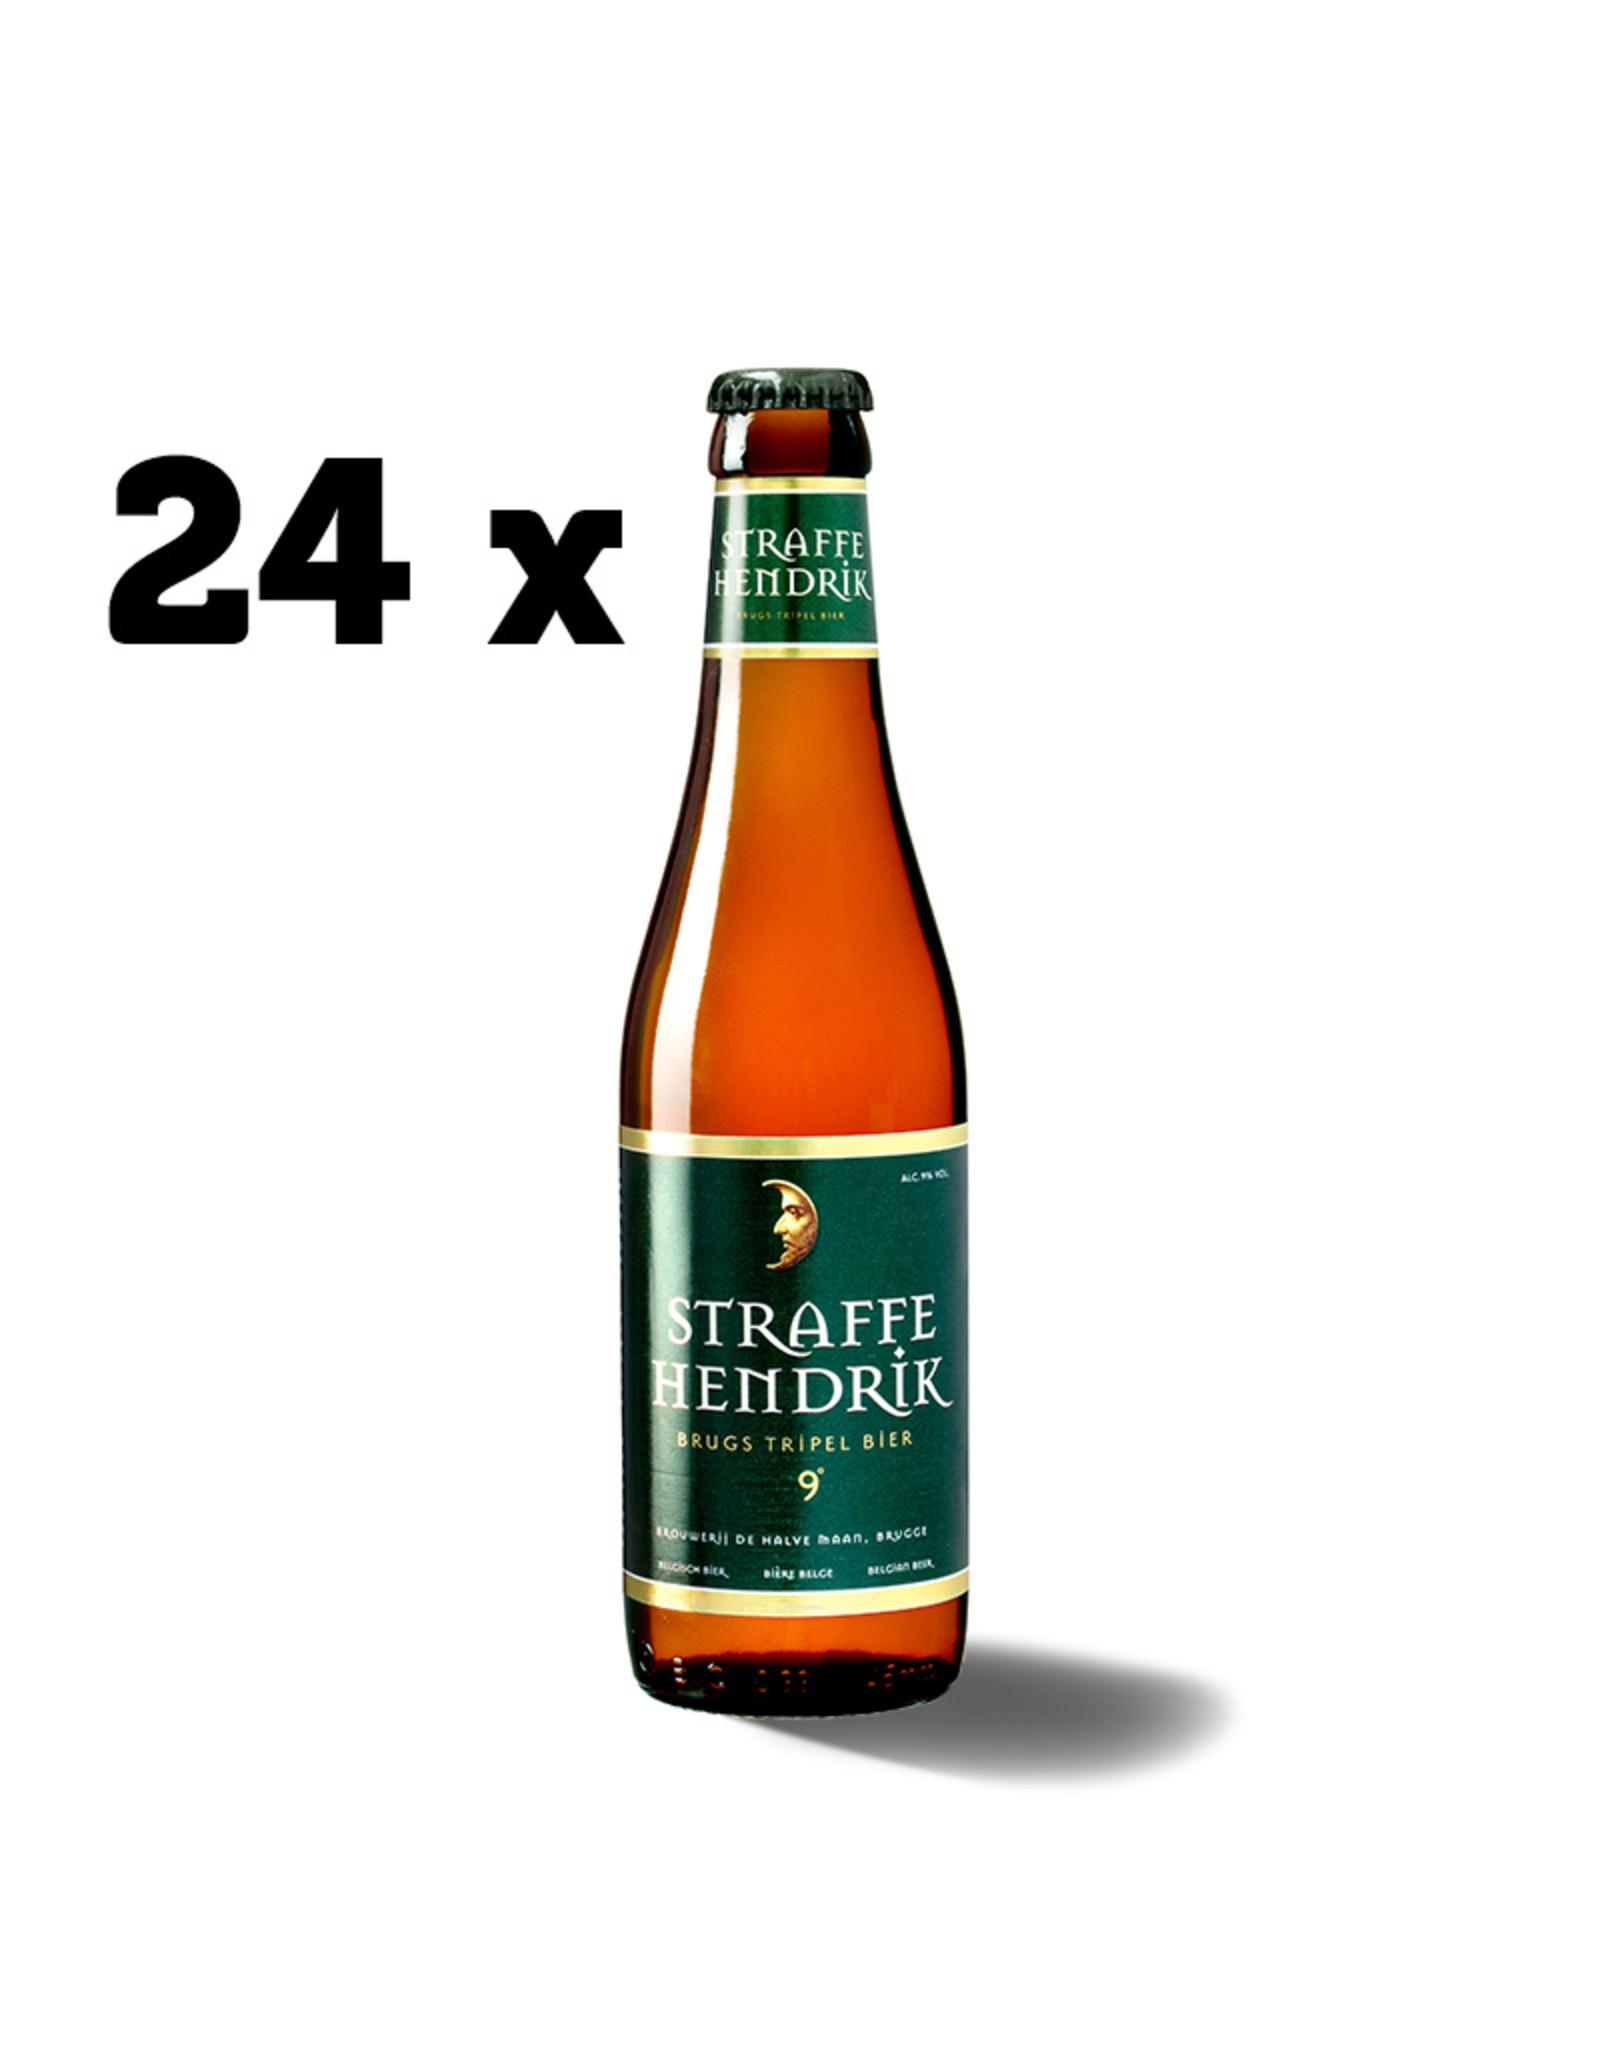 Straffe Hendrik Straffe Hendrik Tripel Bac 24 X 33 cl